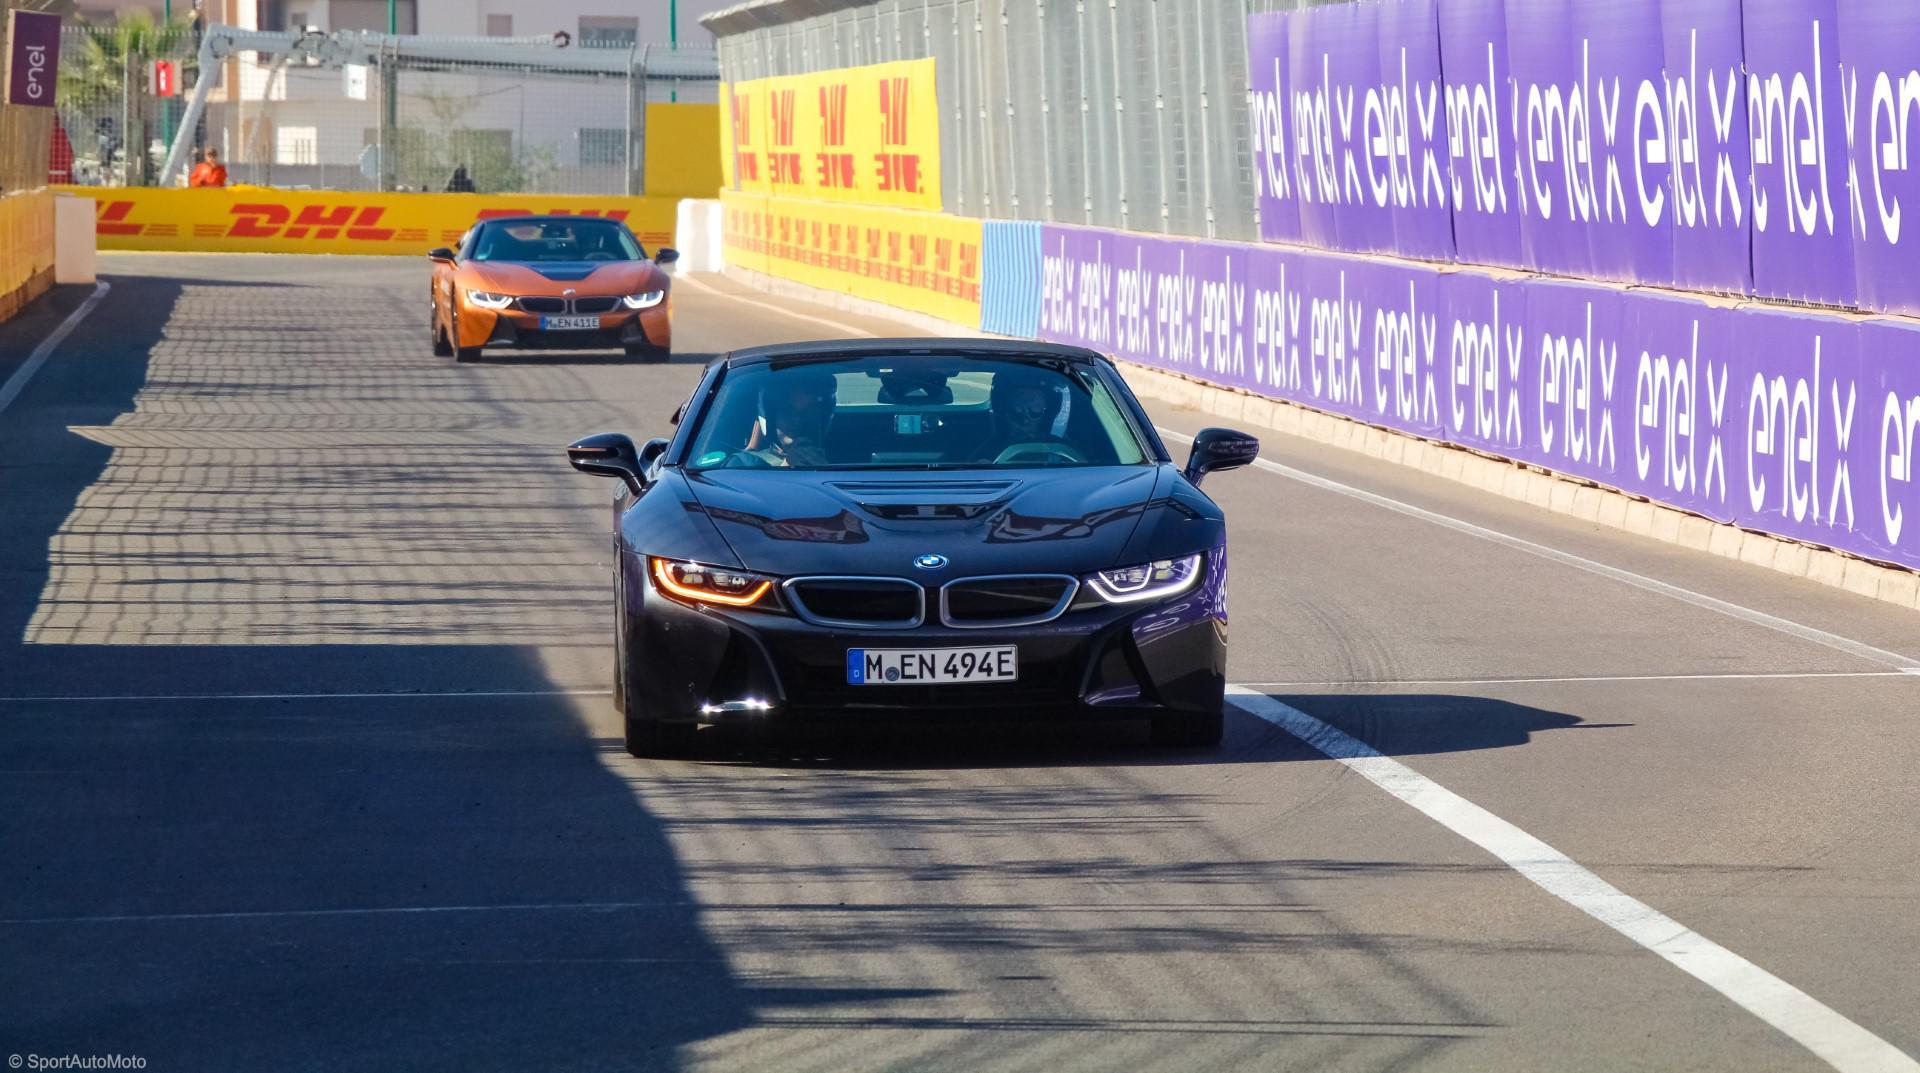 nous-avons-teste-la-bmw-i8-roadster-sur-circuit-975-11.jpg